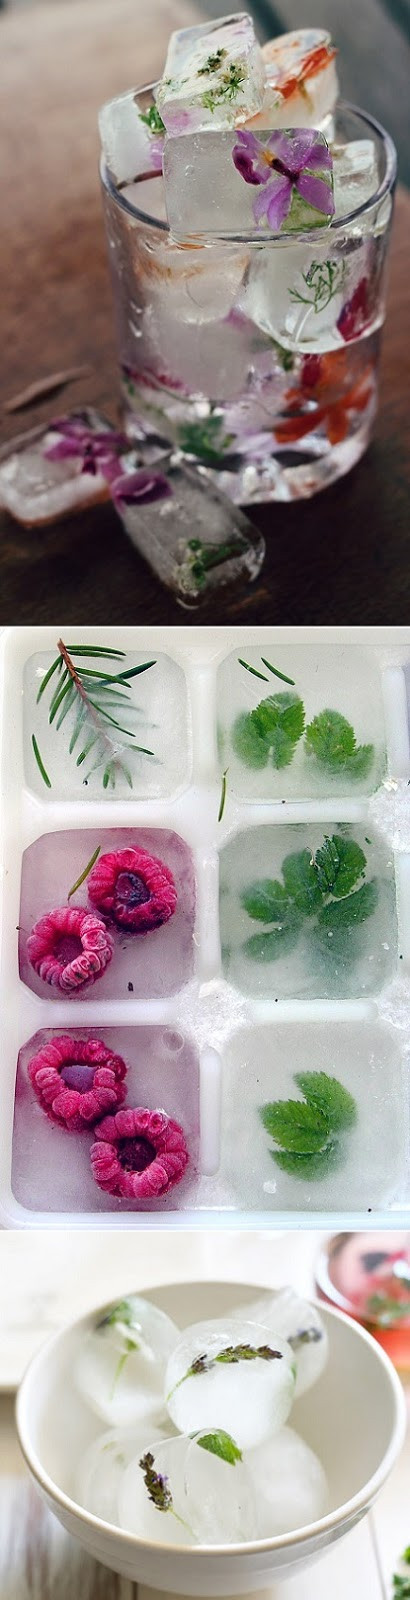 fancy ice cubes